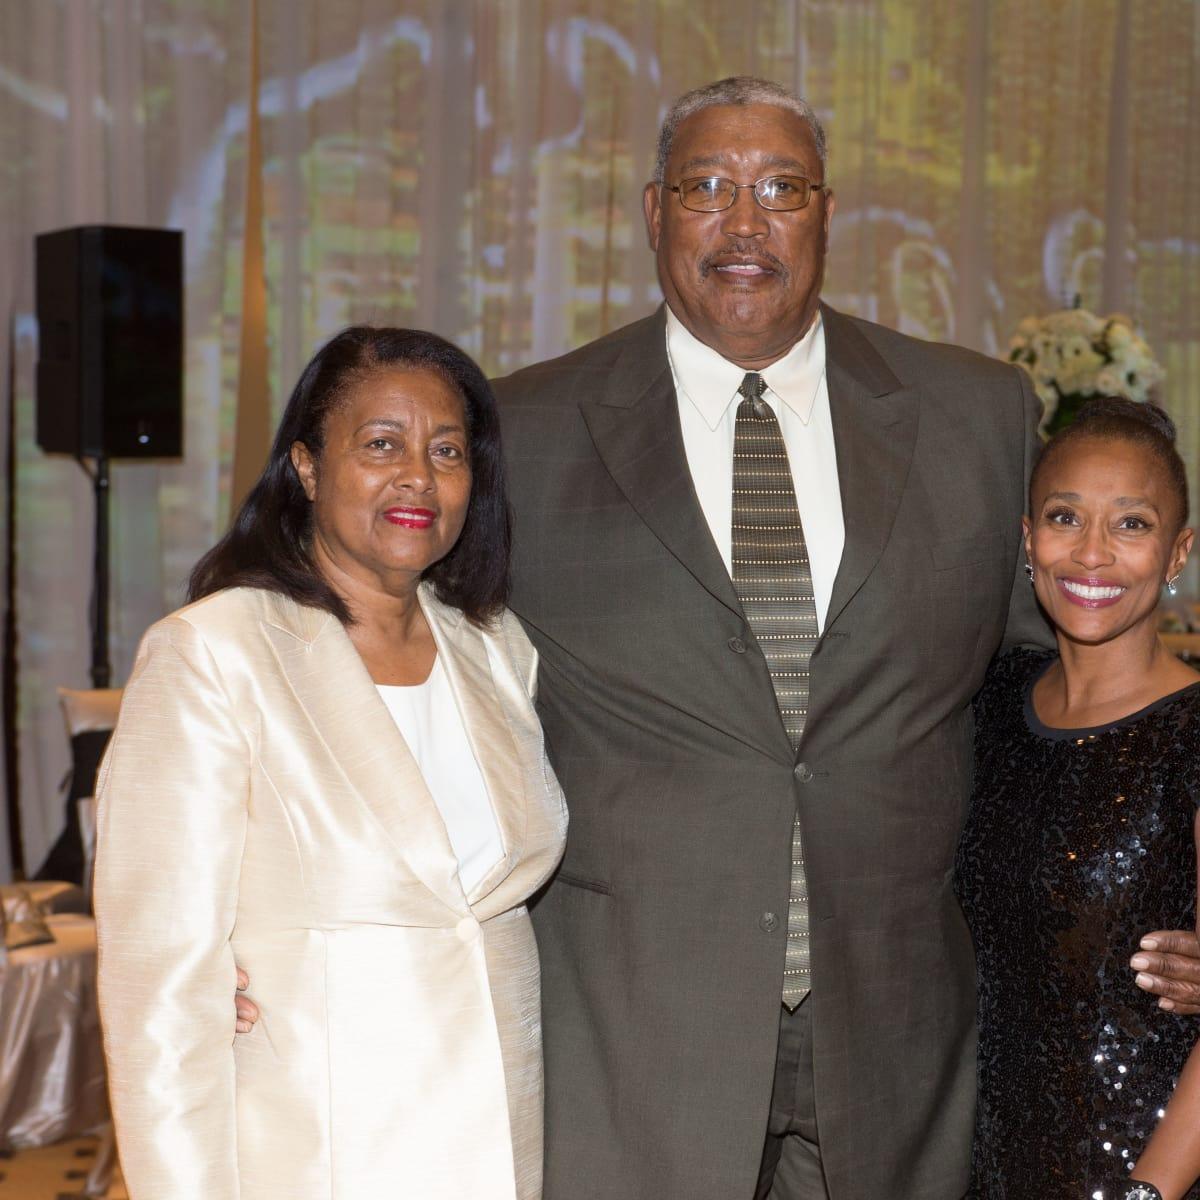 Covenant House Gala, March 2016, Lula Richard, J.R. Richard, Jacqueline Fair